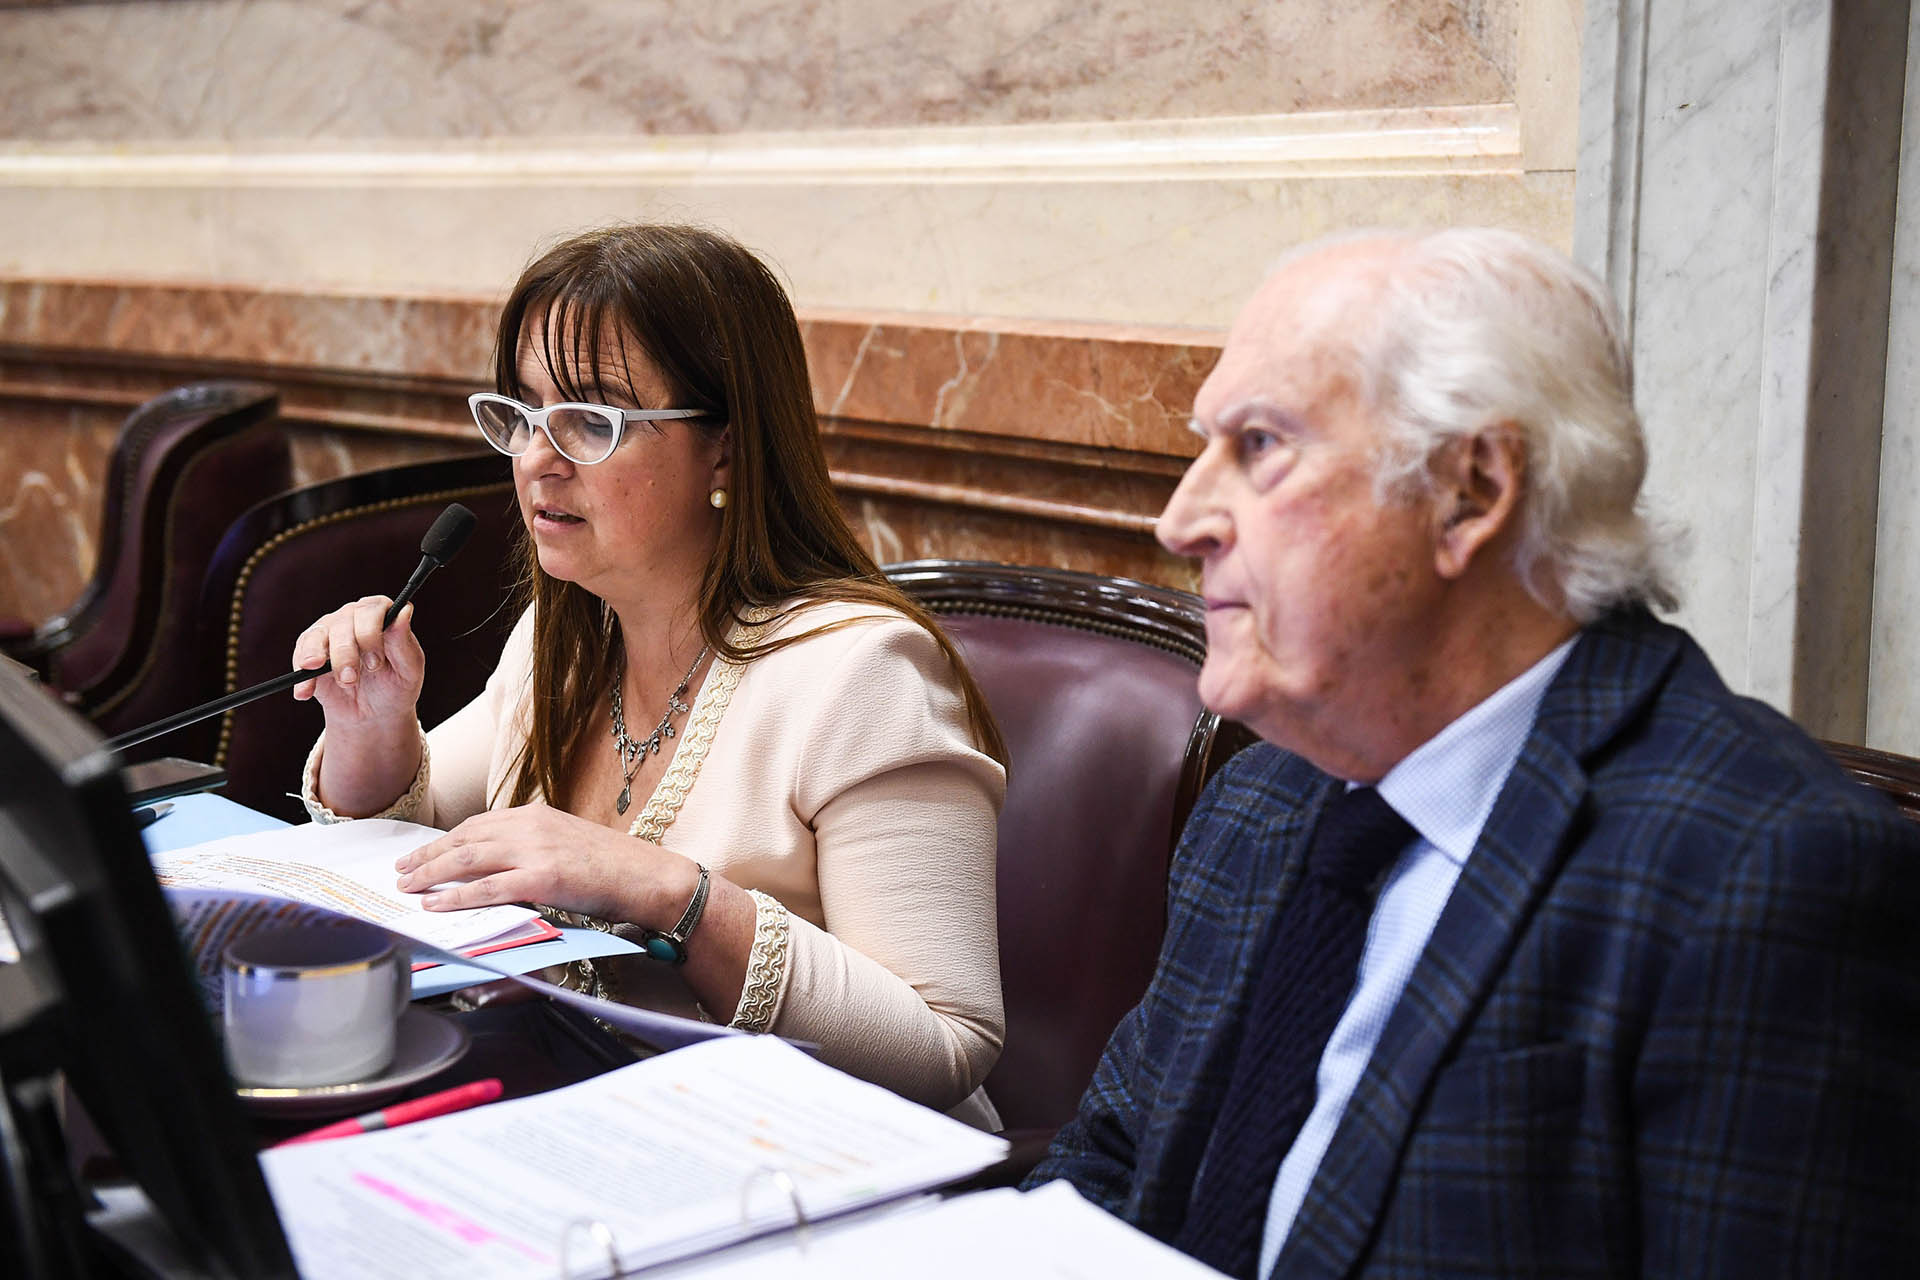 Fernando Pino Solanas escucha a la senadora Magdalena Quintana